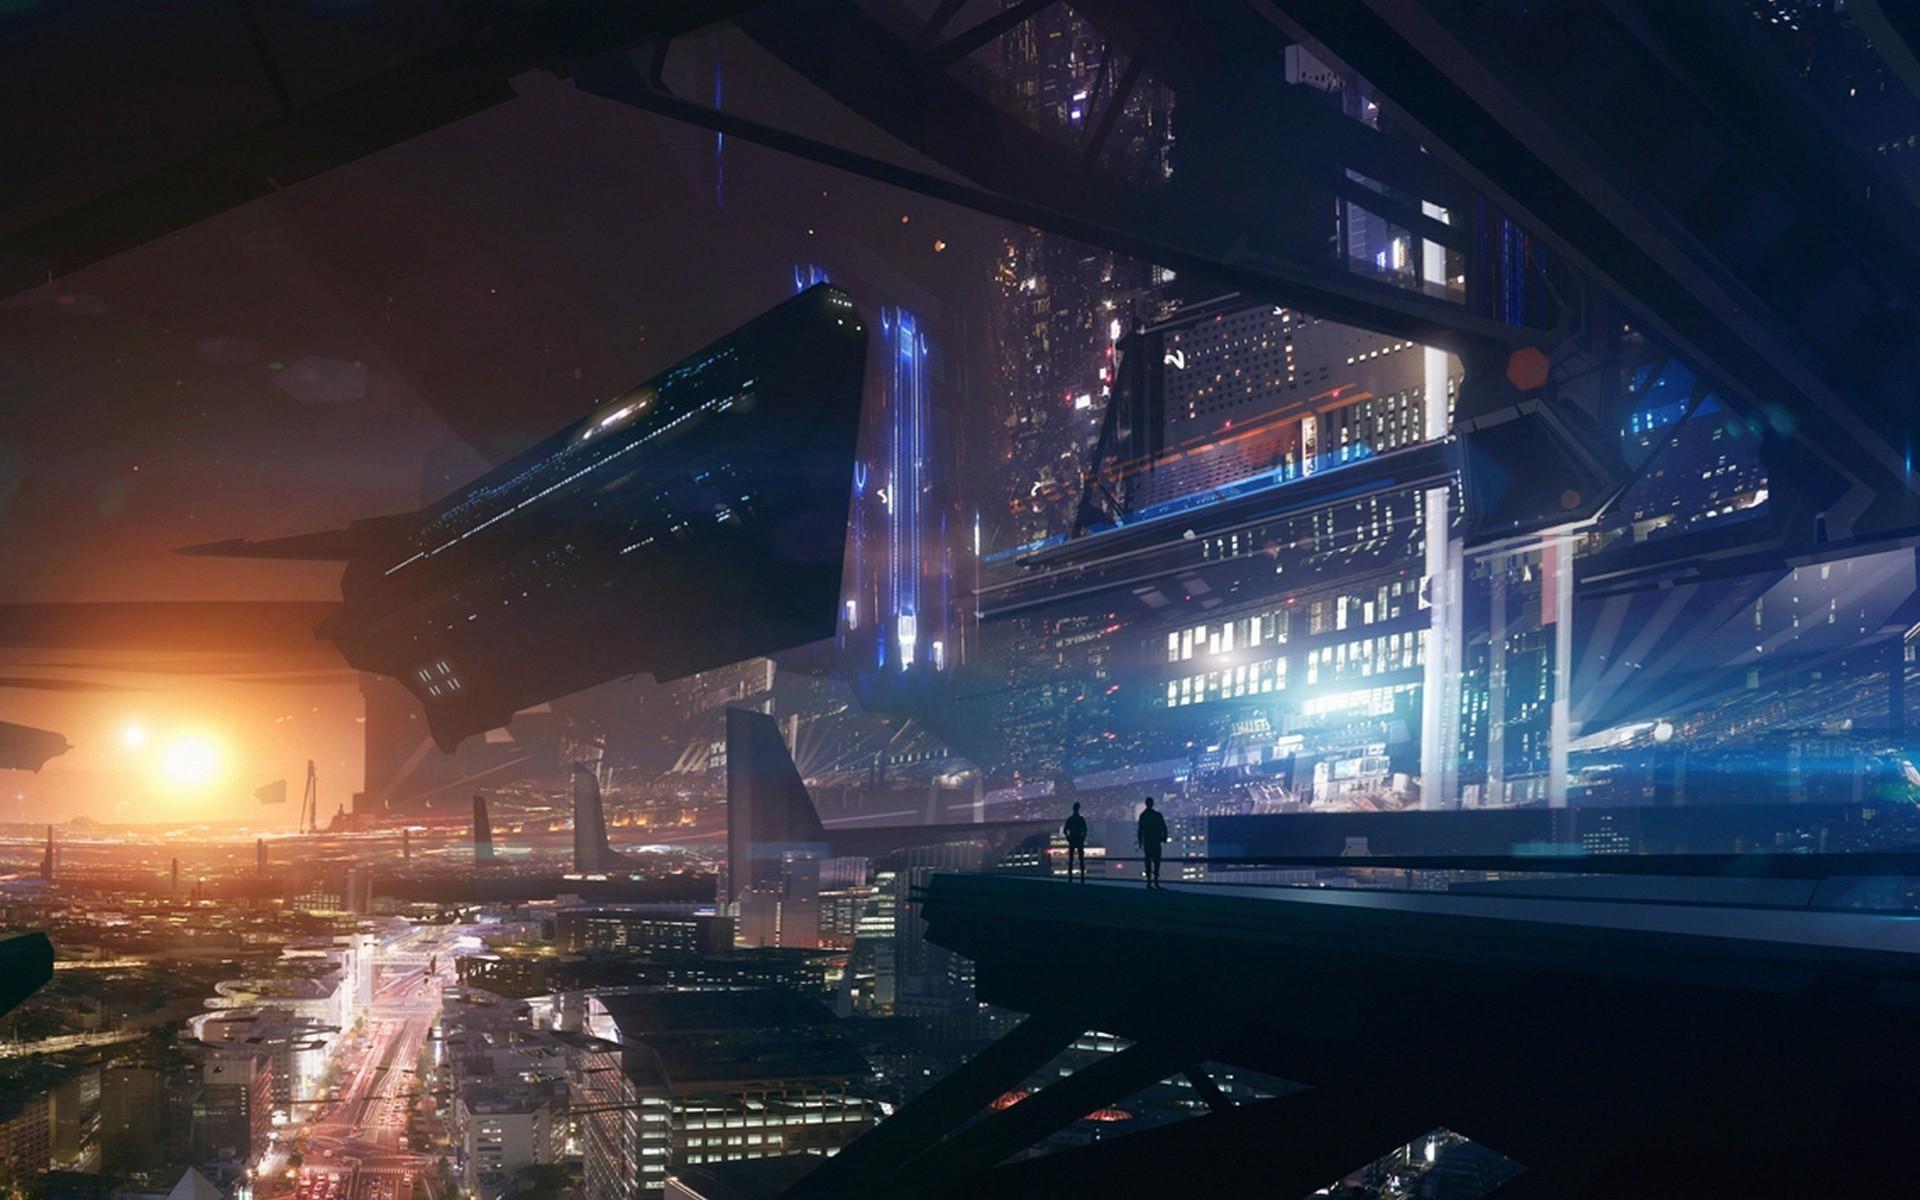 Future City Wallpaper (76+ images)